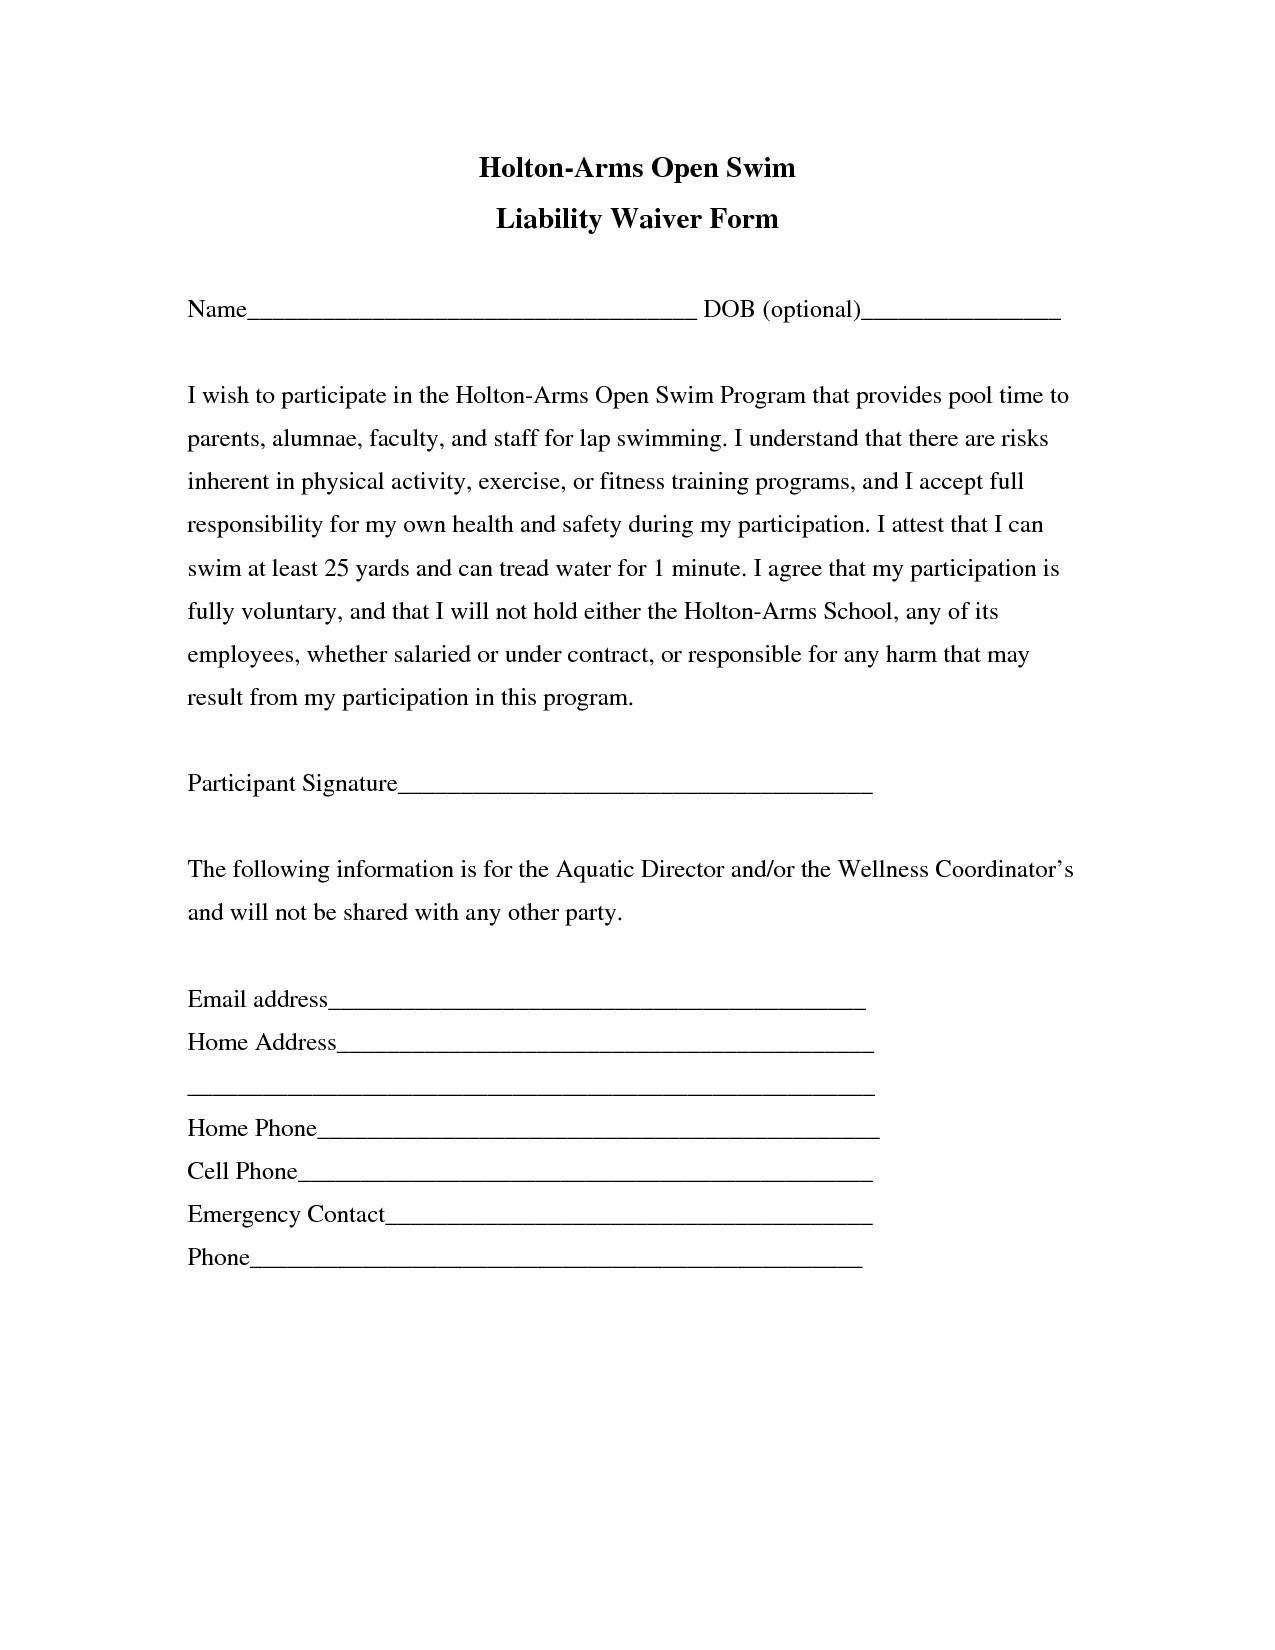 Divorce Settlement Document